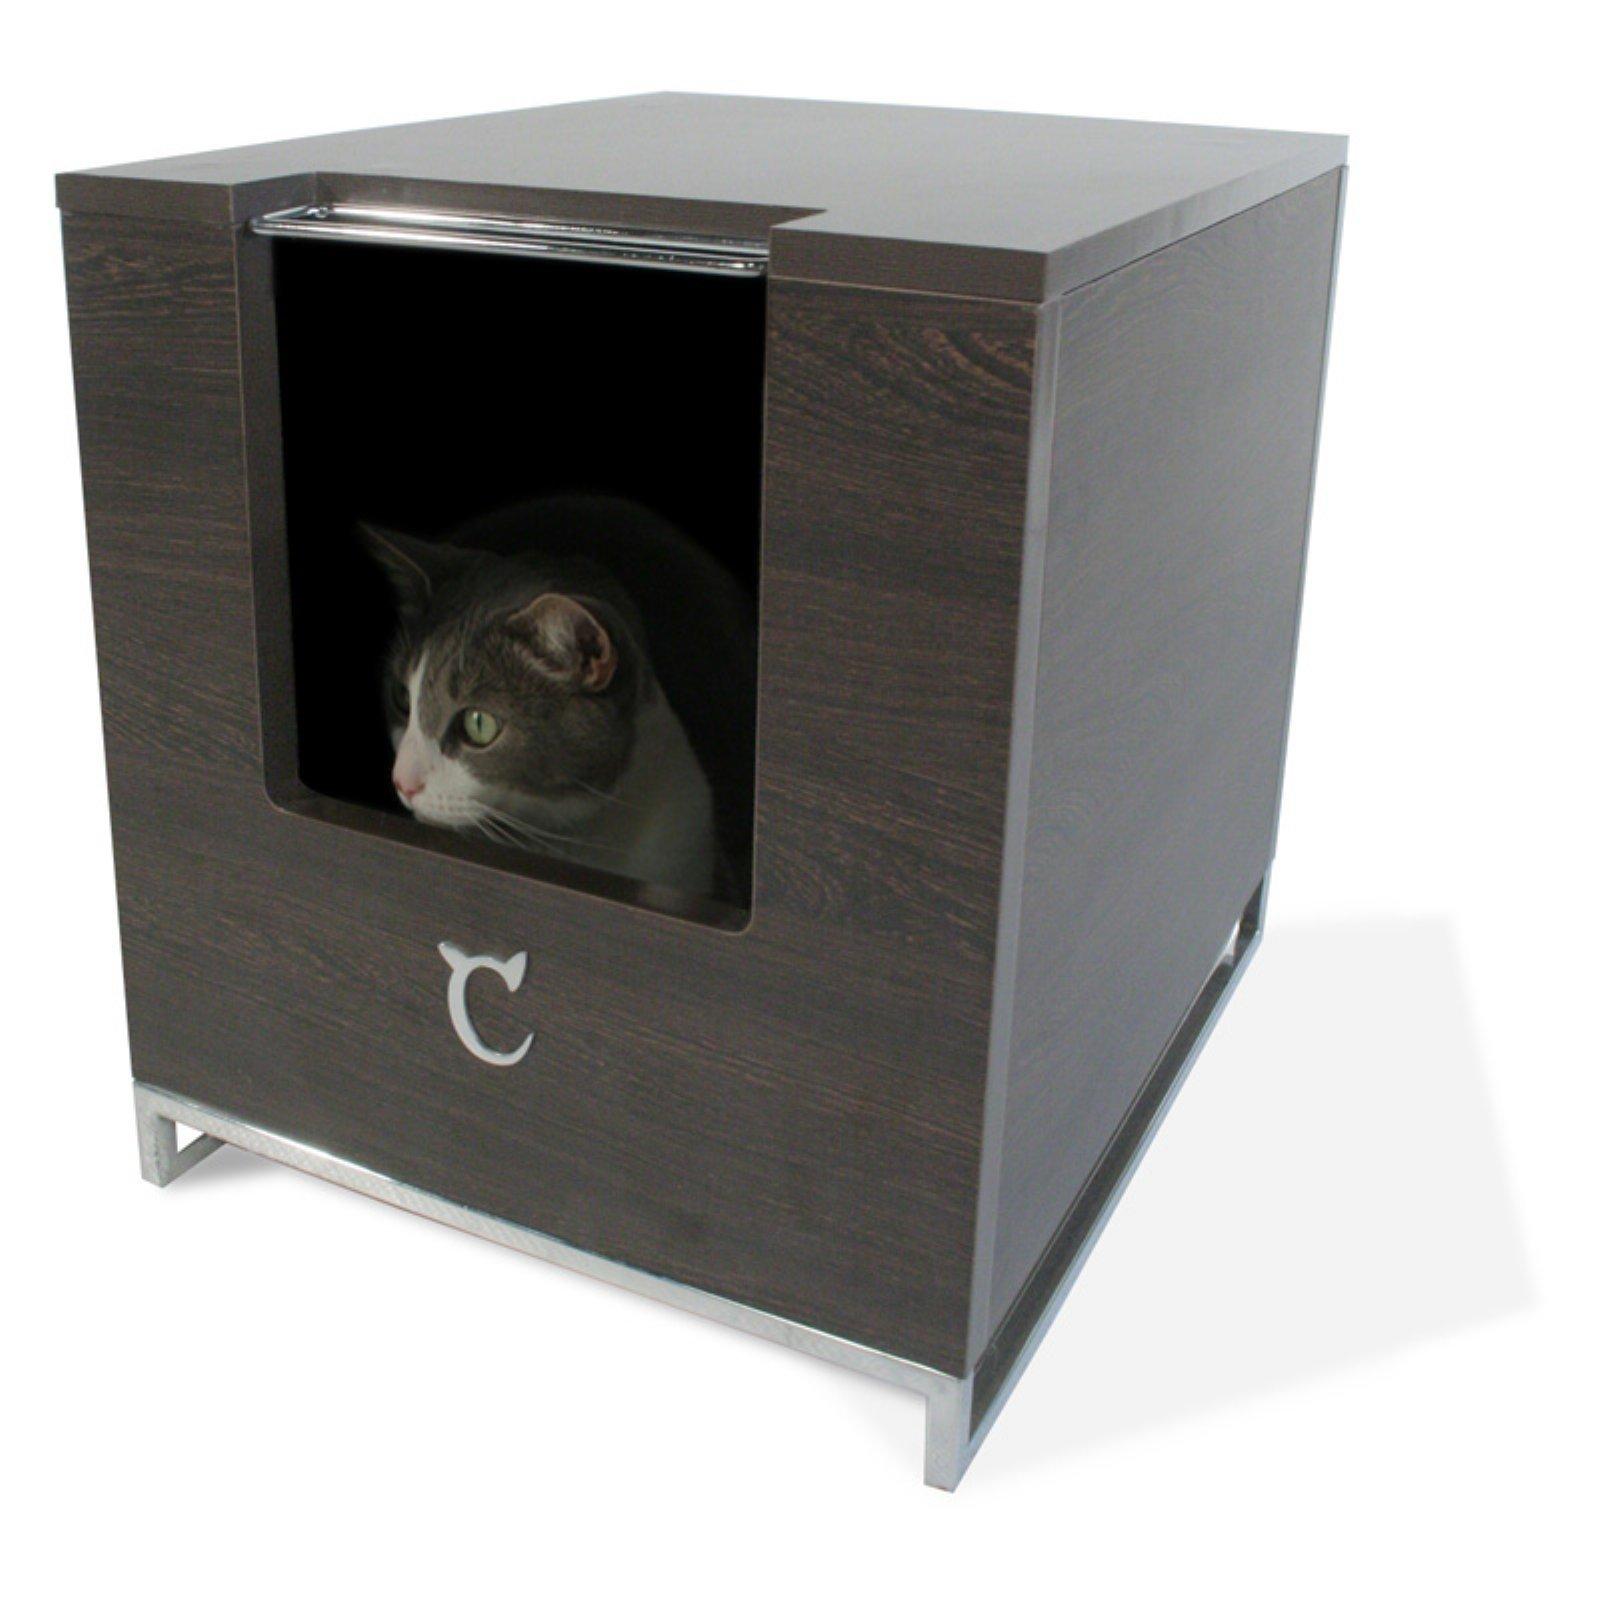 Modern Cat Designs TT-LH01-W Litter Box Hider44; Glossy White